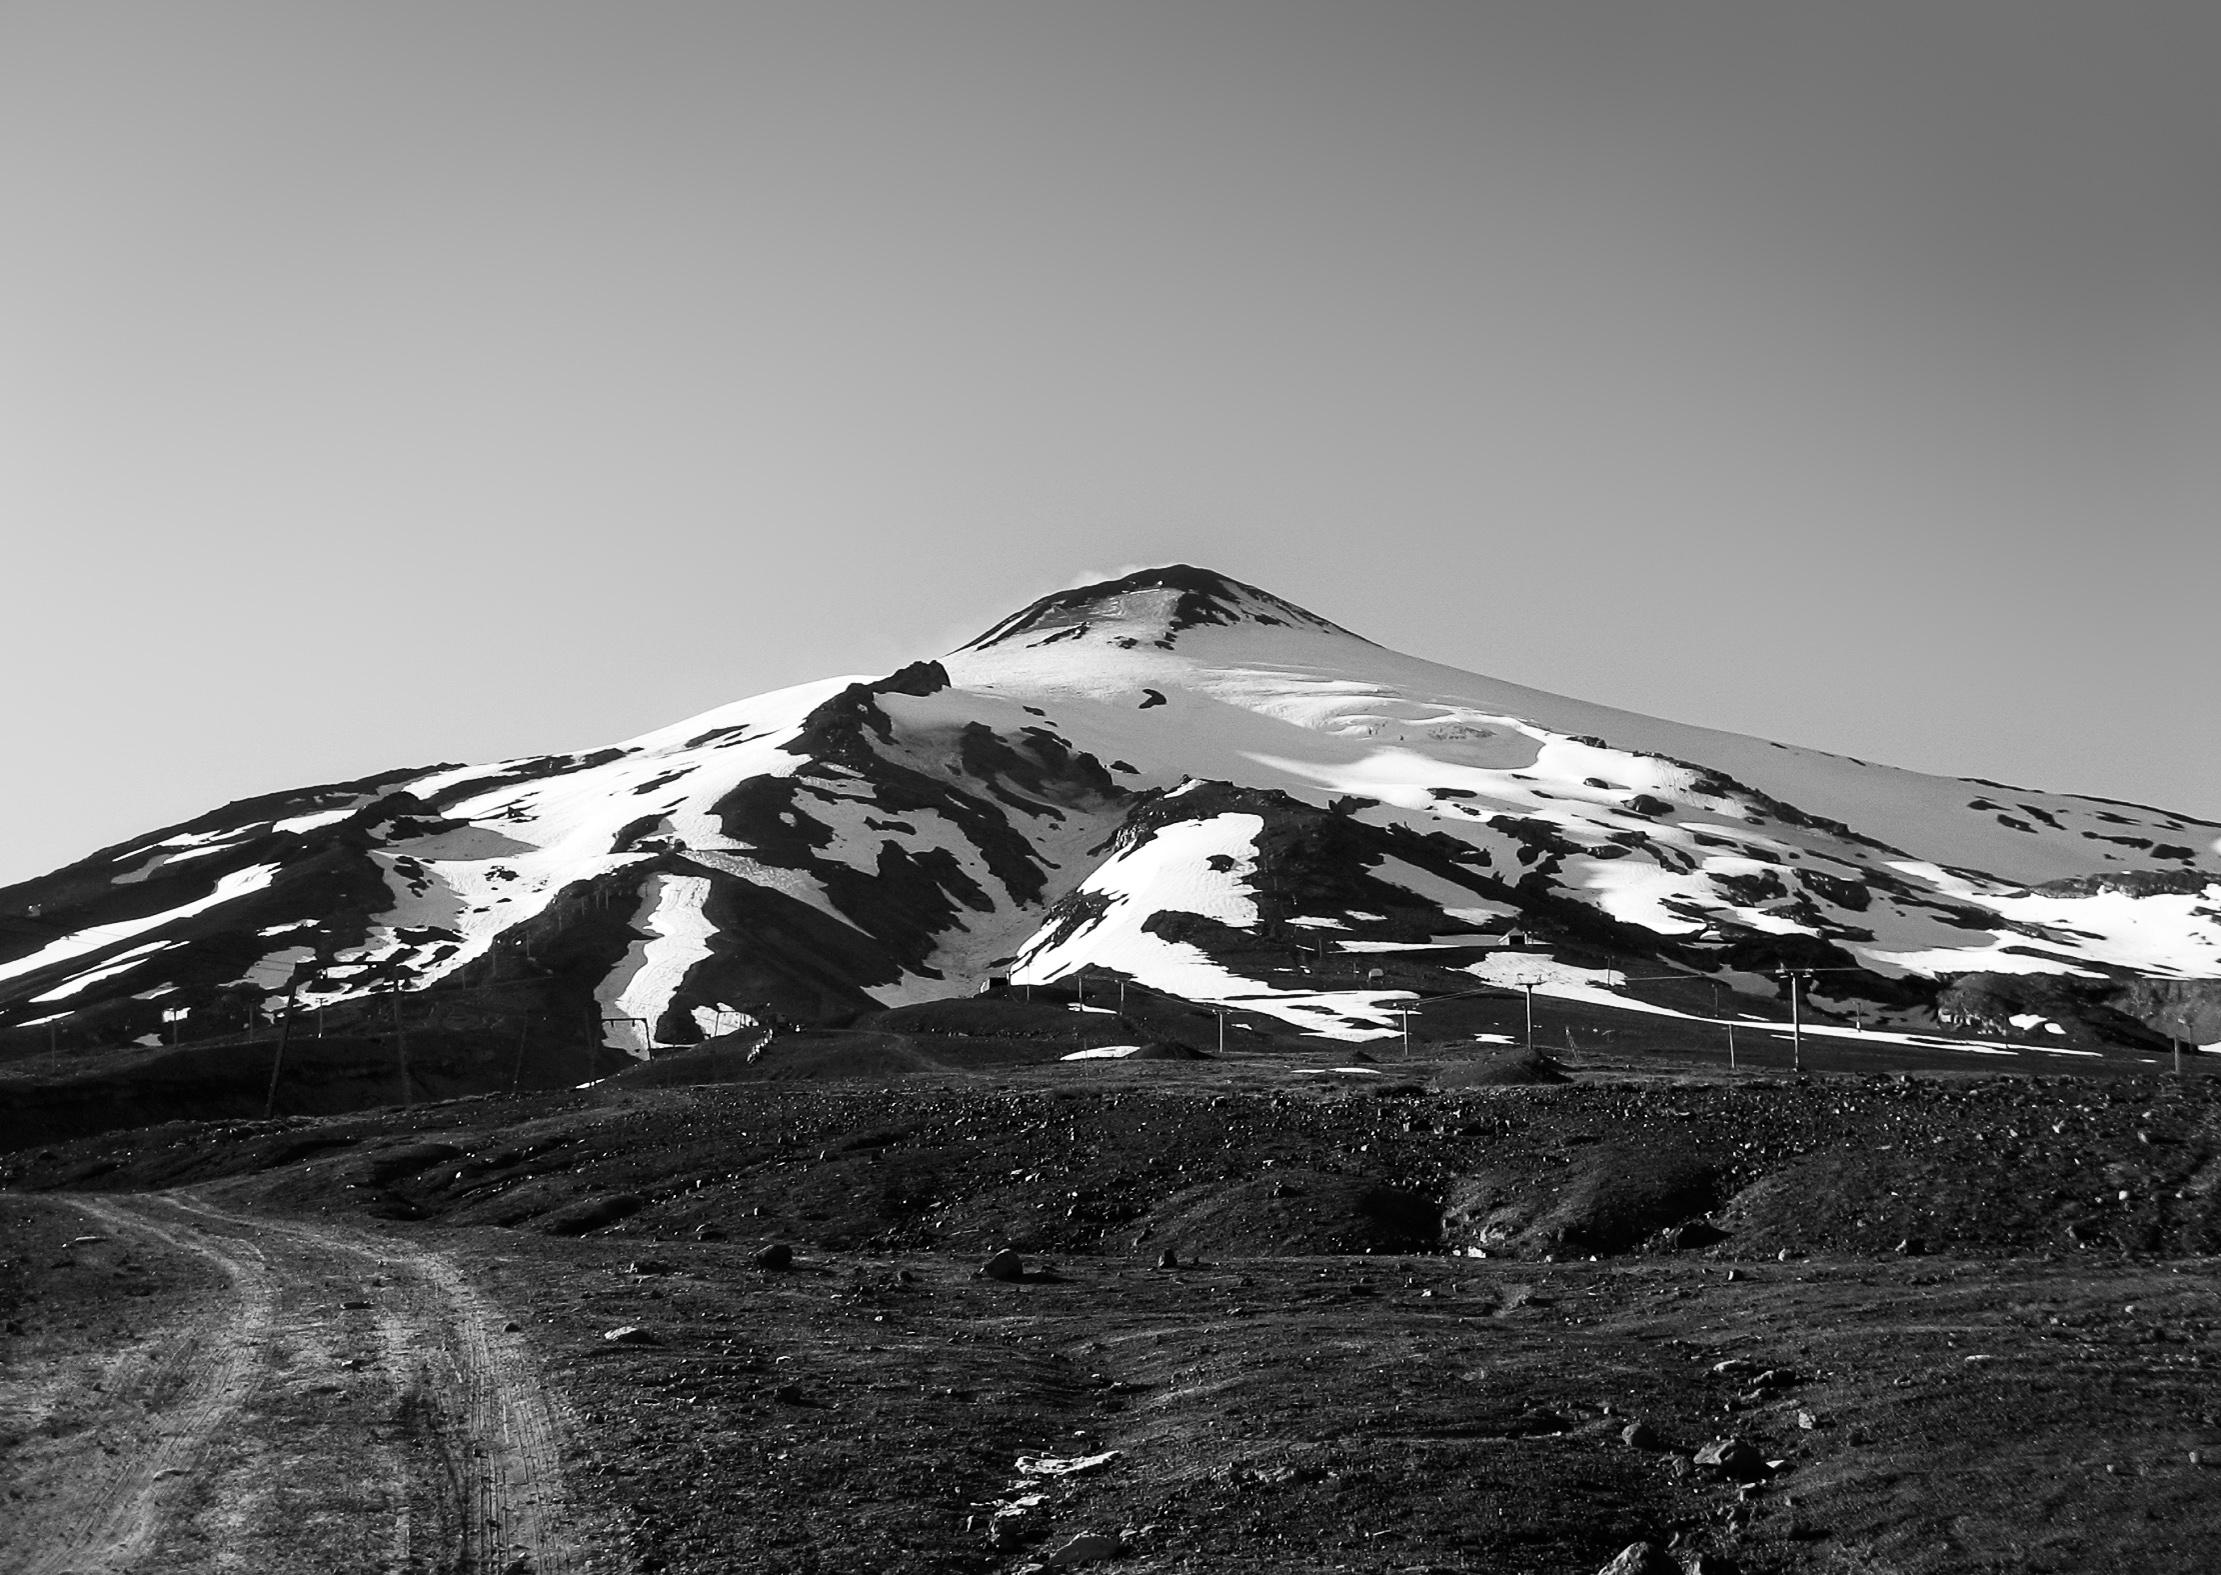 pucon_villarrica_volcano-excursion-227-_volcano-villarrica-from-dirtroad.jpg